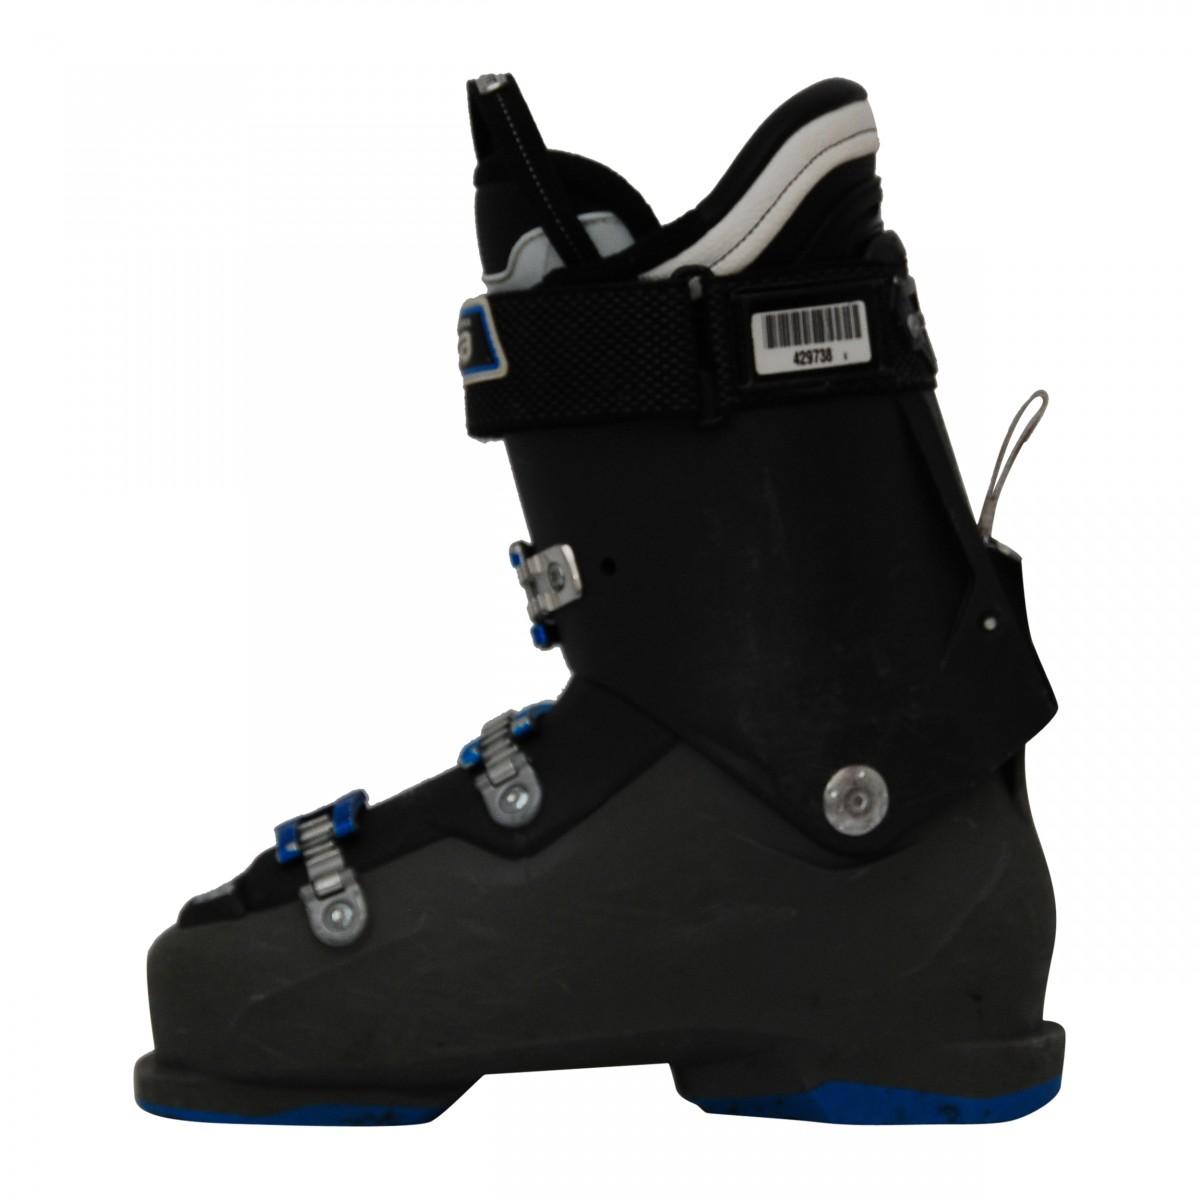 Chaussure-de-ski-occasion-Tecnica-Magnum-90-RT miniature 4